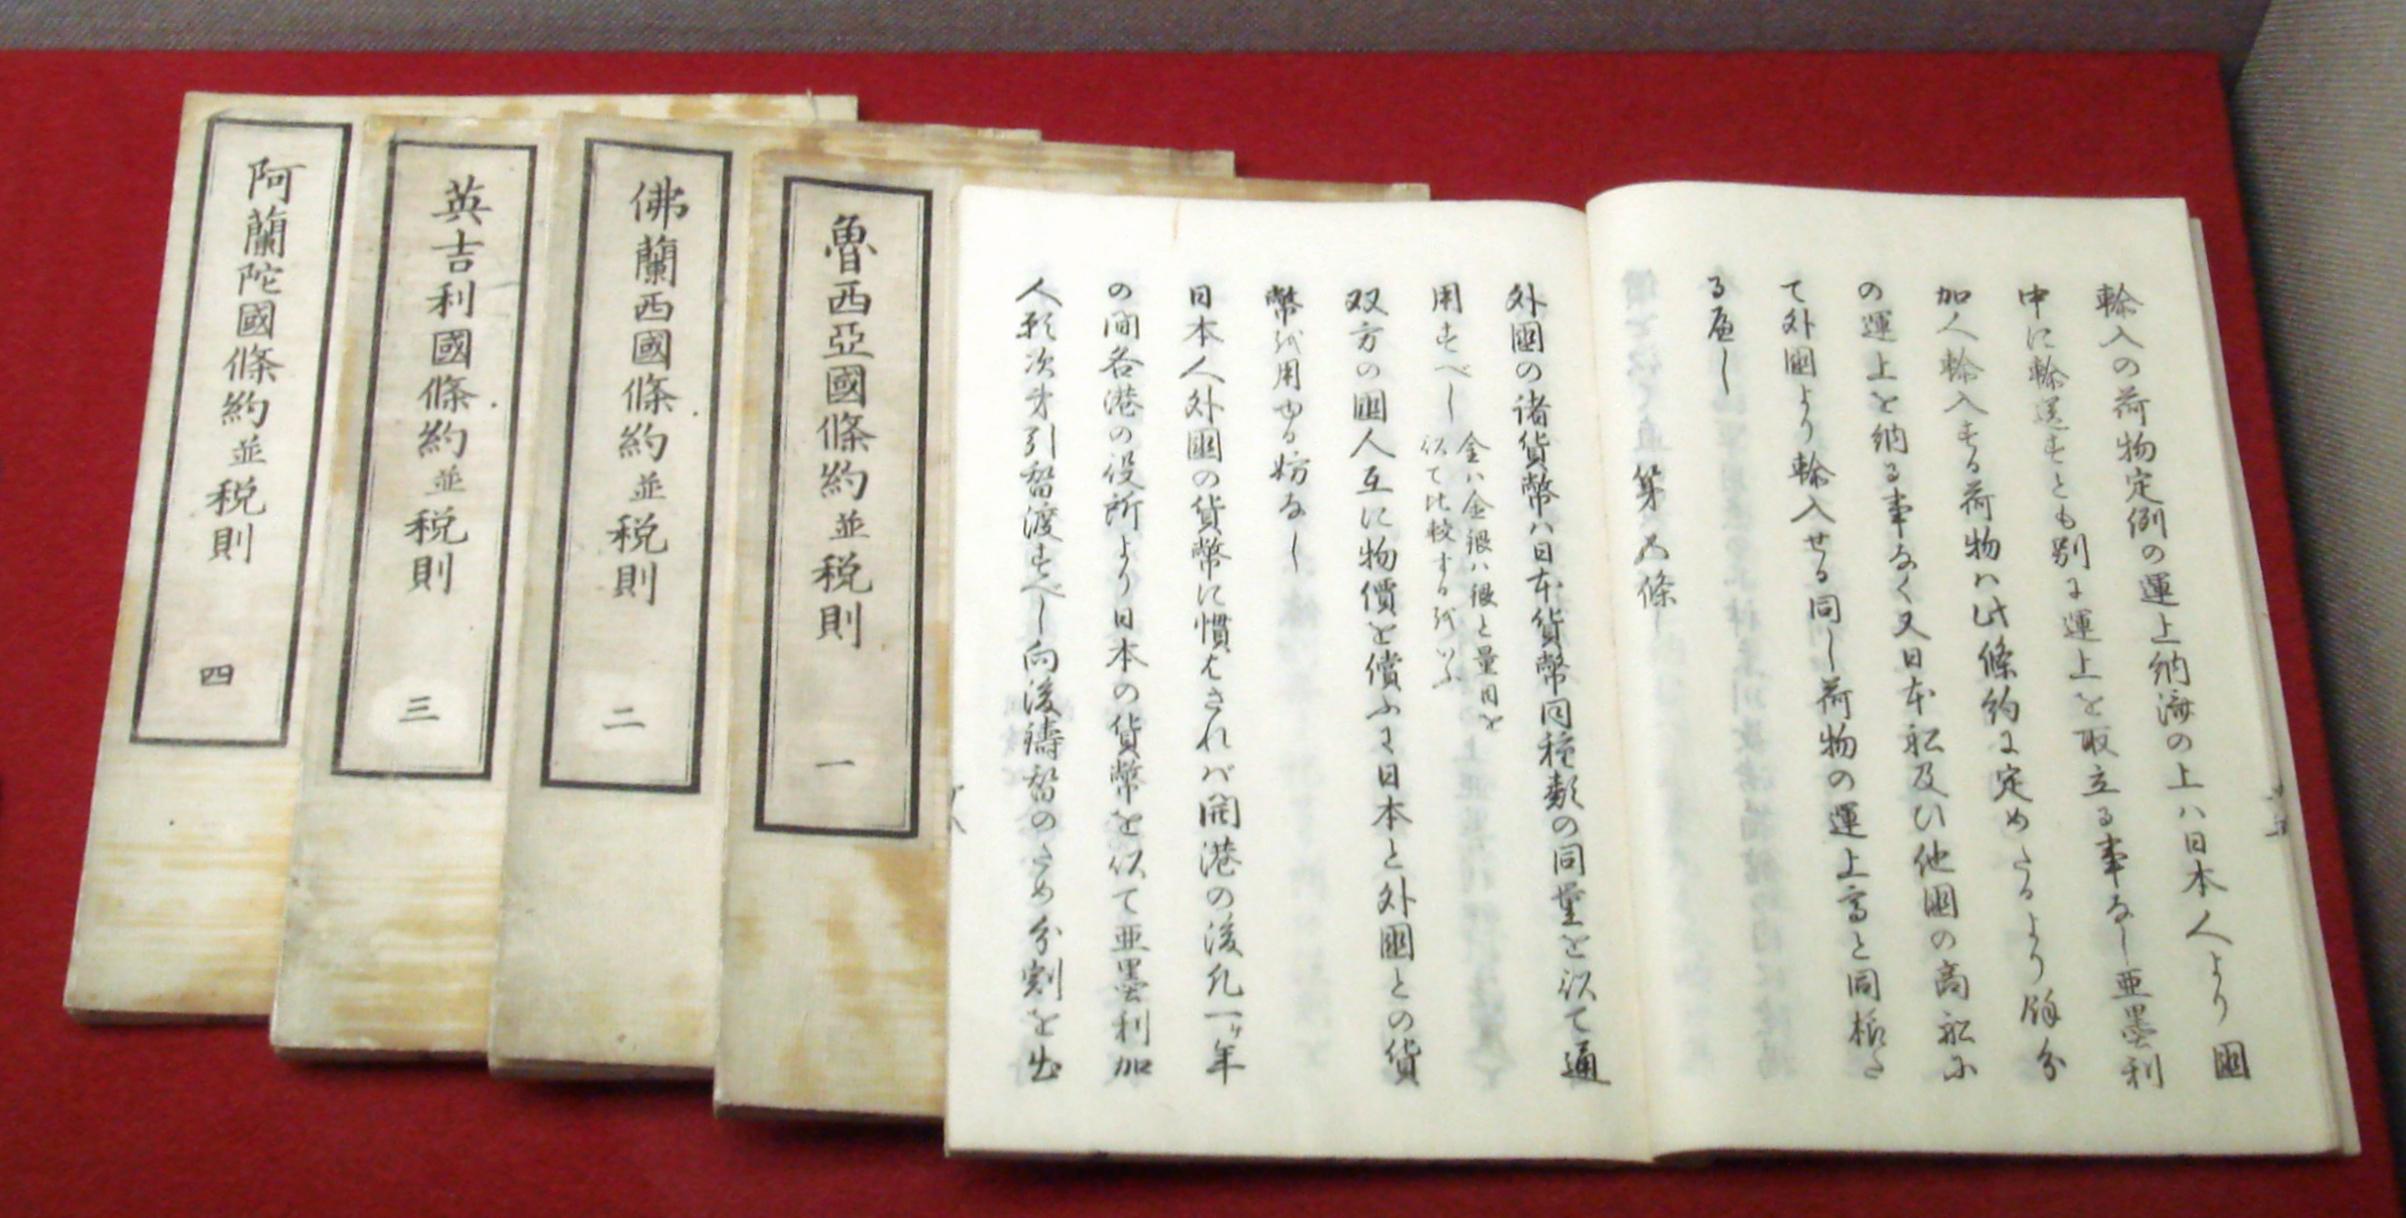 Japanandhollandenglandfrancerussiaandtheunitedstates1858